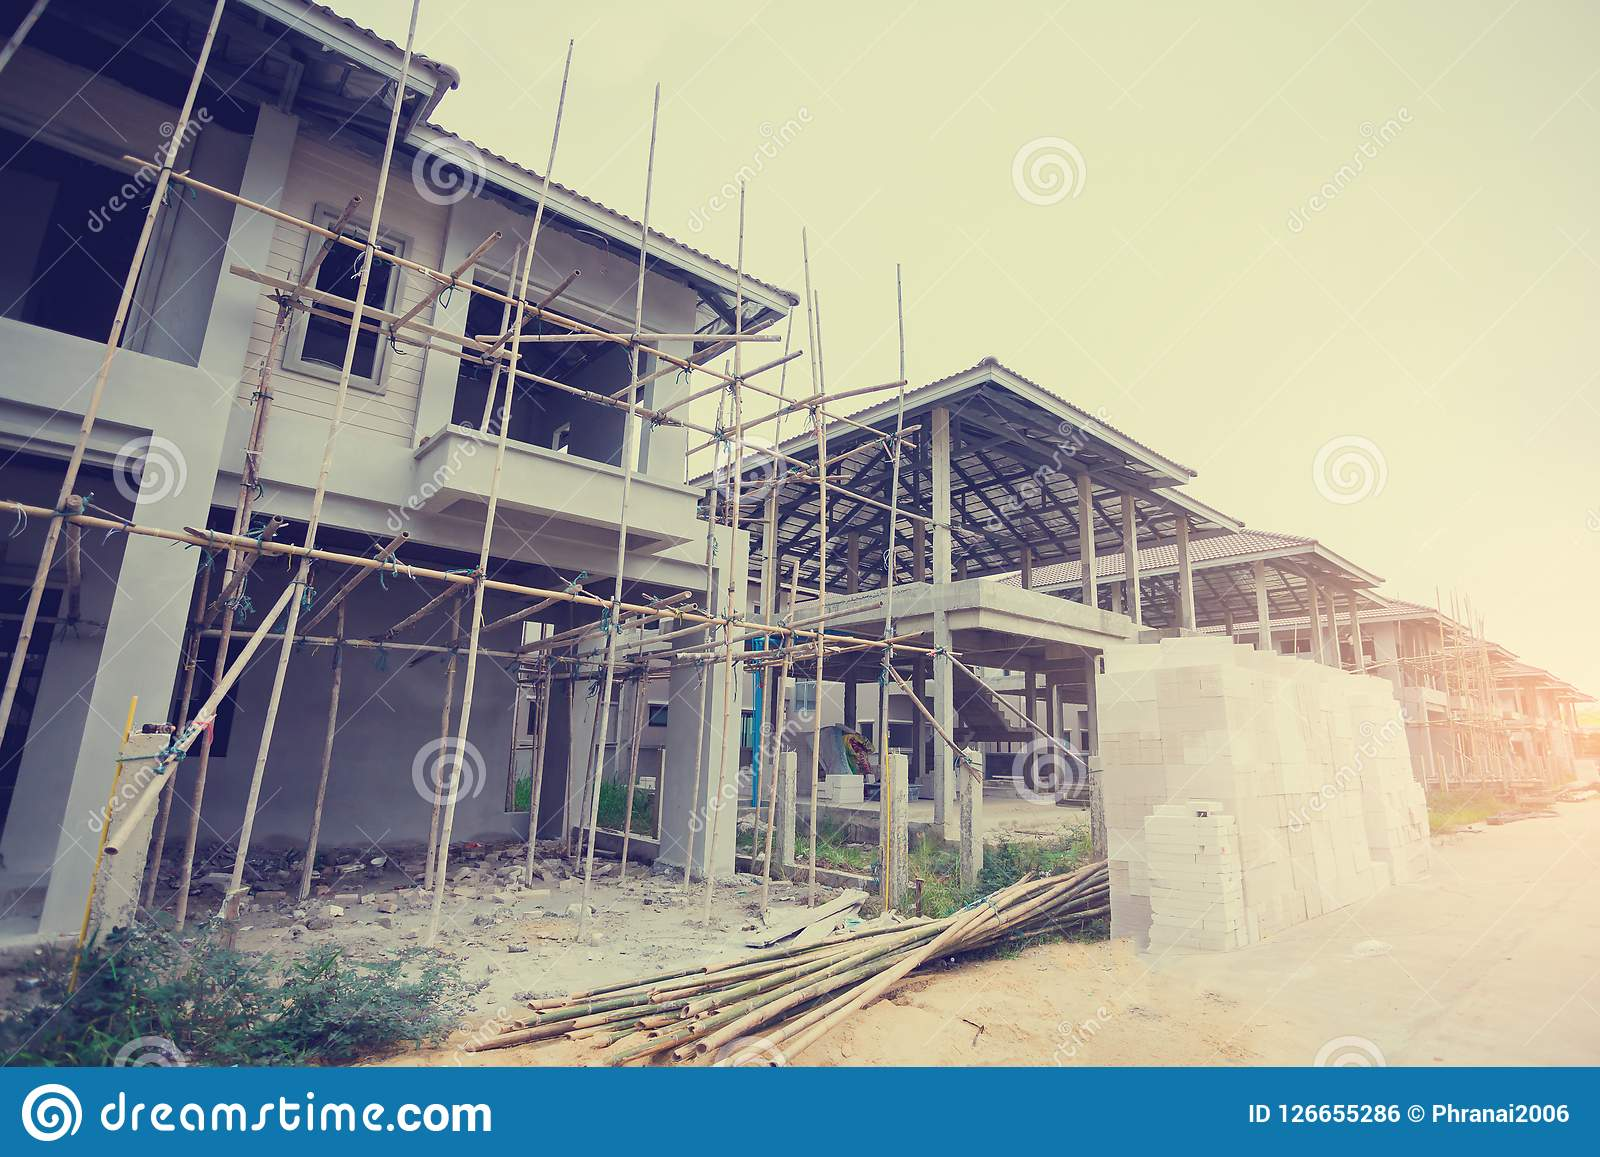 Case recentemente sviluppate in una proprietà residenziale in Tailandia